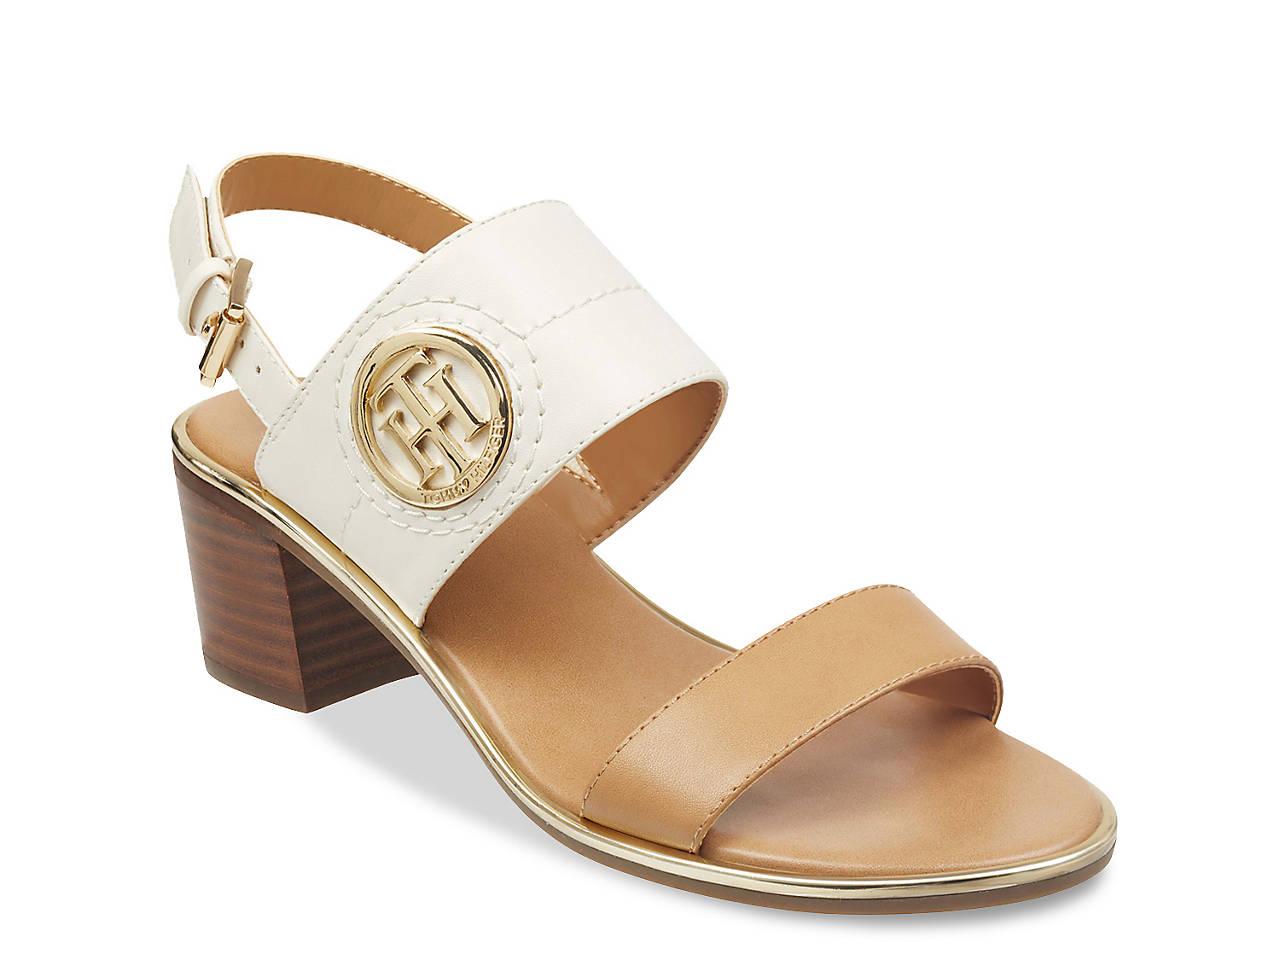 6ebecffb0ebd Tommy Hilfiger Kellia Sandal Women s Shoes